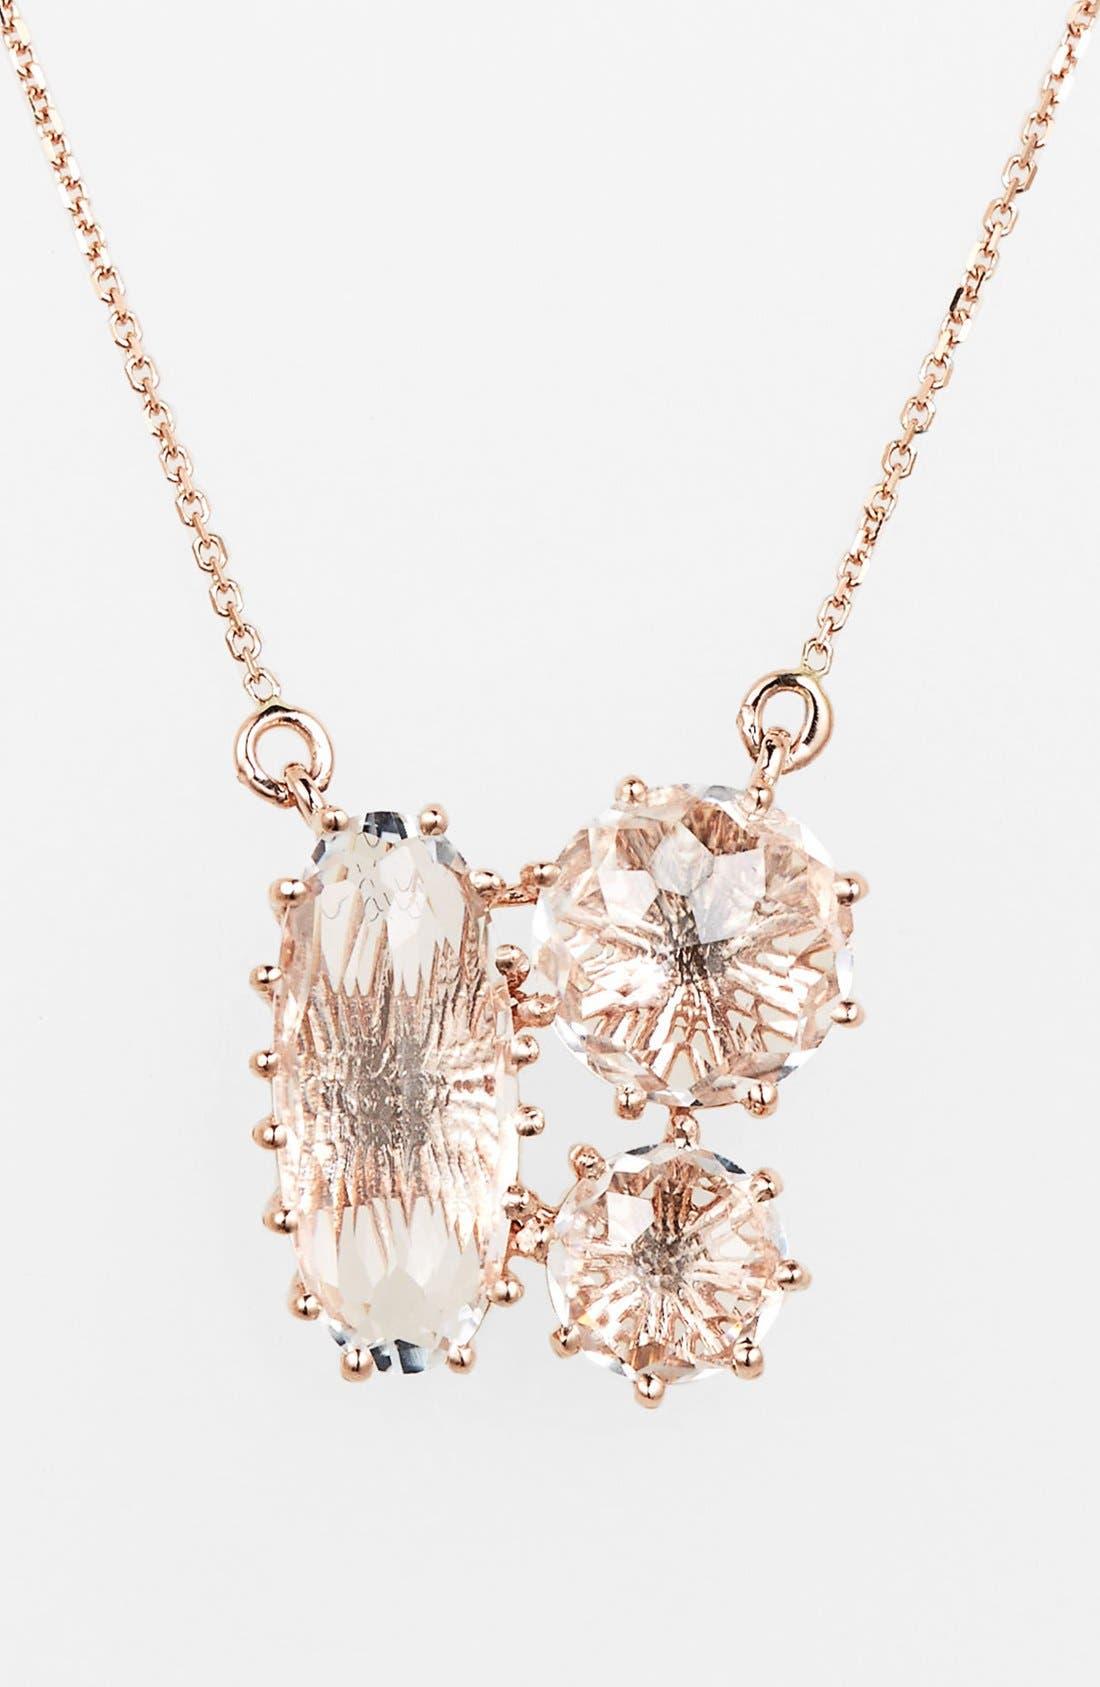 Main Image - KALAN by Suzanne Kalan Stone Cluster Pendant Necklace